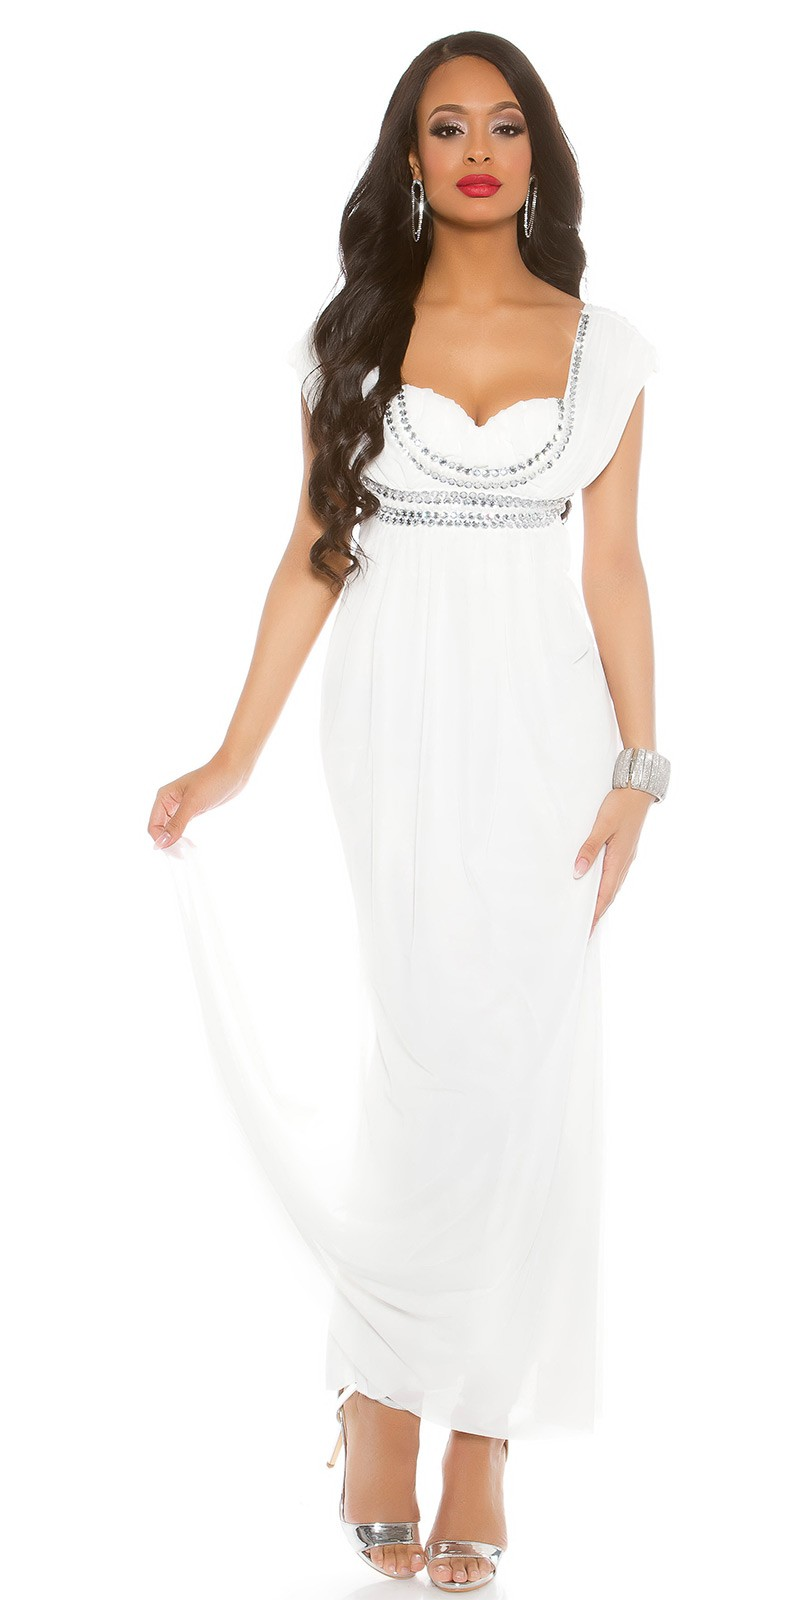 691e6d6056e4 aaCarpet Look Sexy KouCla dress  rhinestones  Color WHITE Size XL 0000K9140 WEISS 20 1  · Biele dlhe spolocenske saty